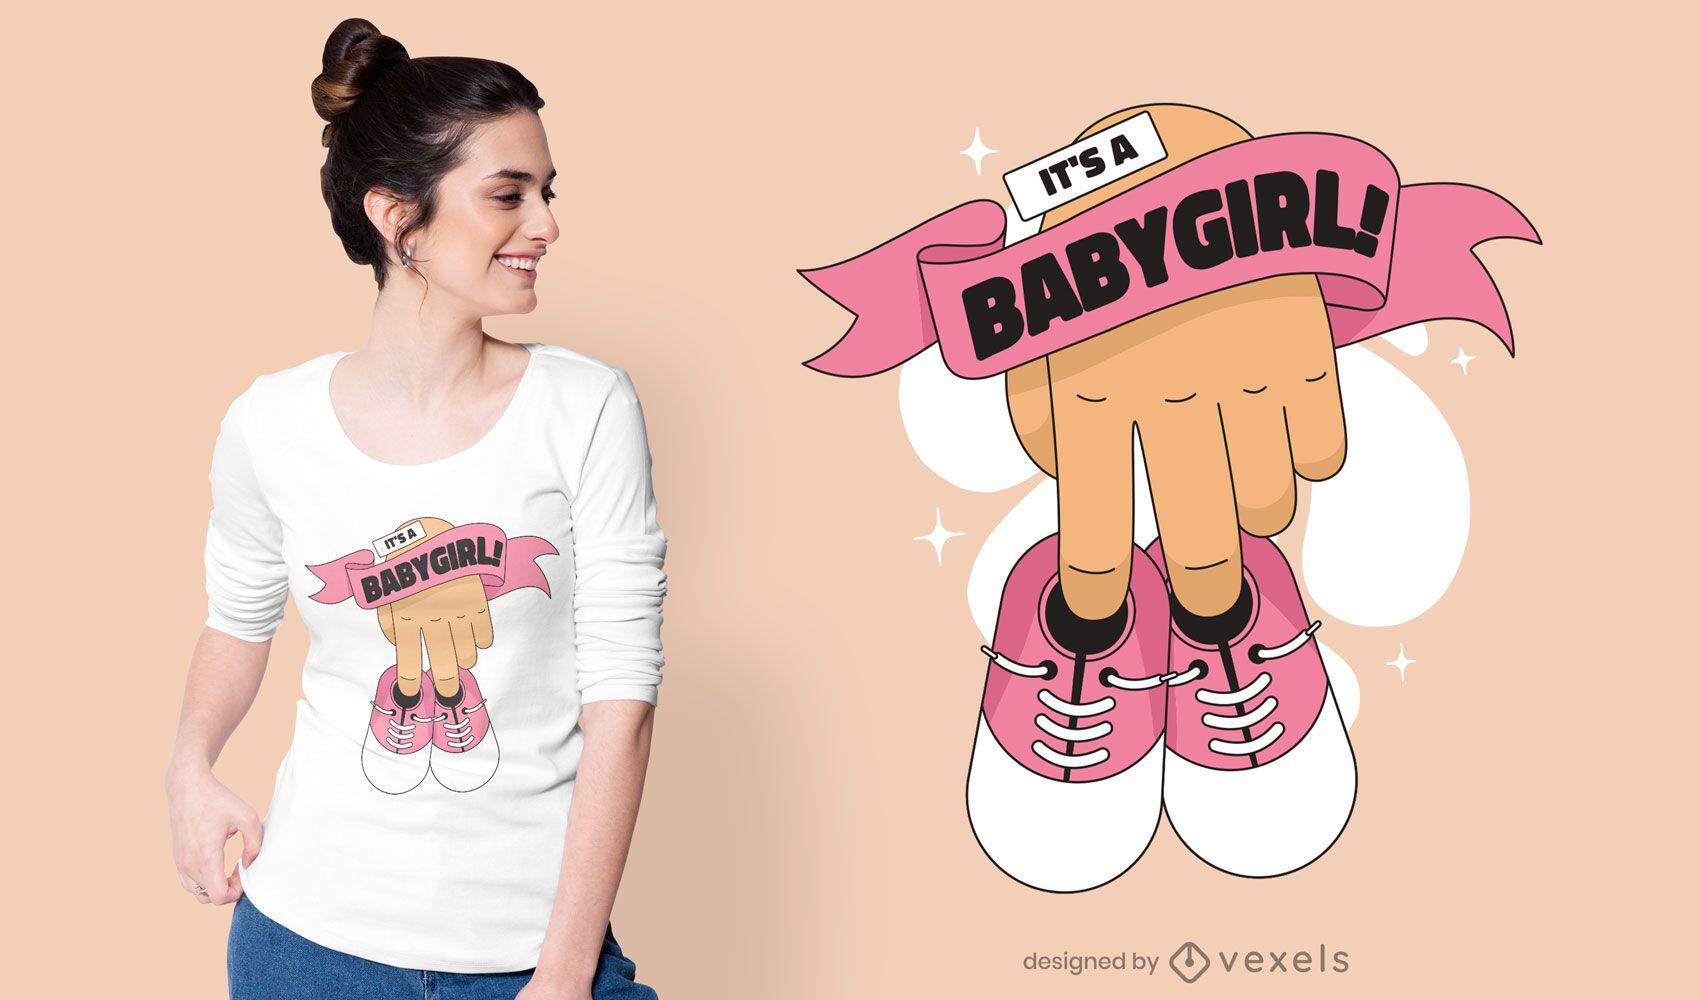 Baby girl shoes t-shirt design